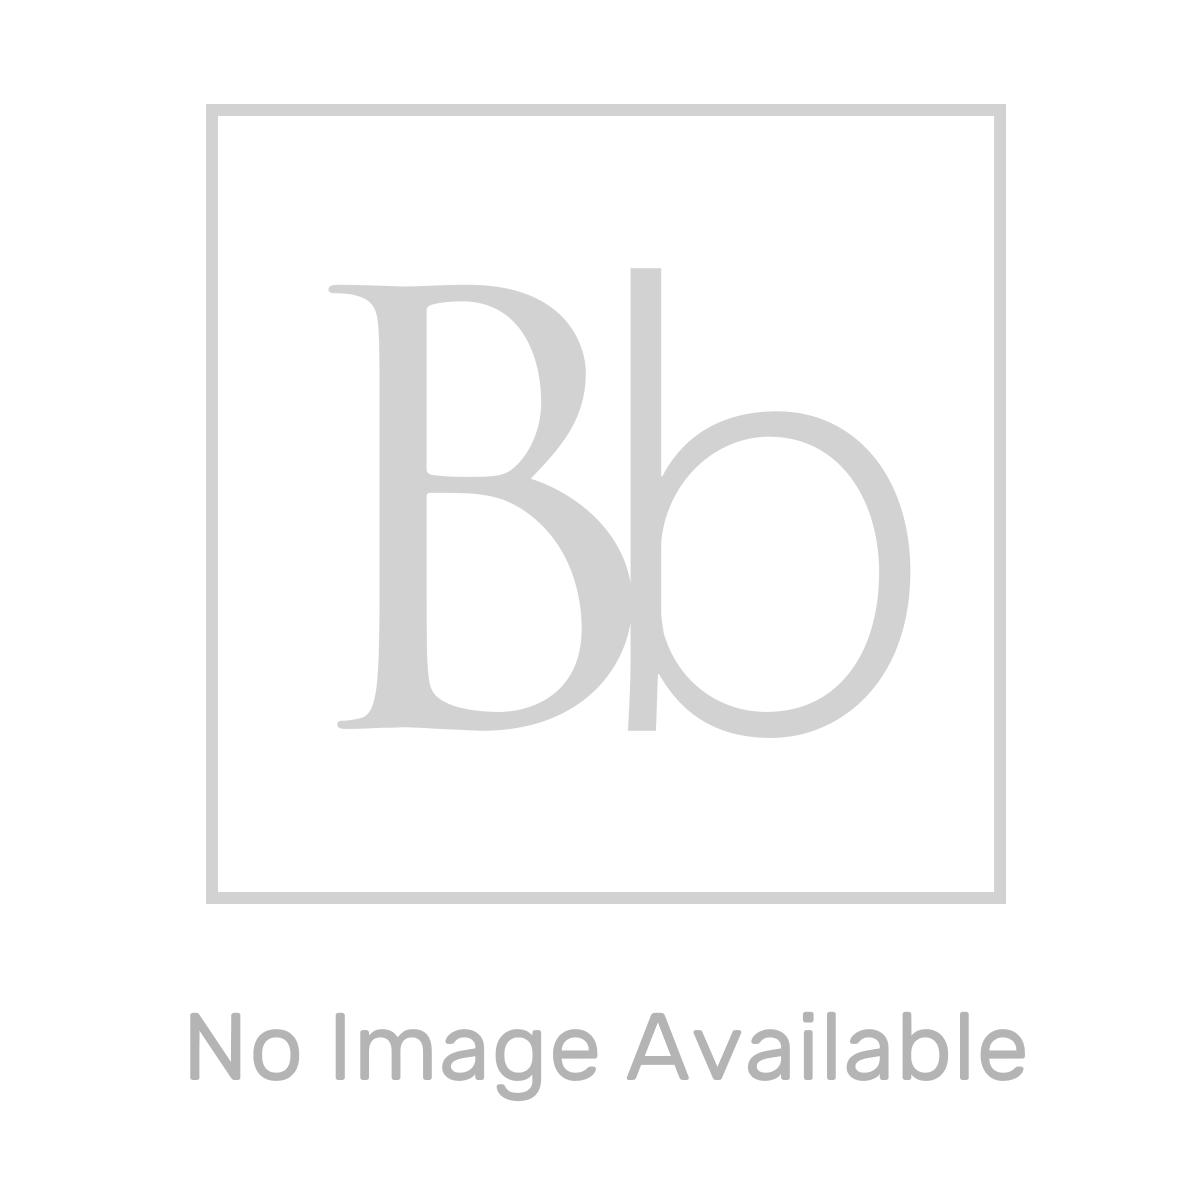 Croydex Hygiene N Clean Rubagrip Medium White Bath Mat